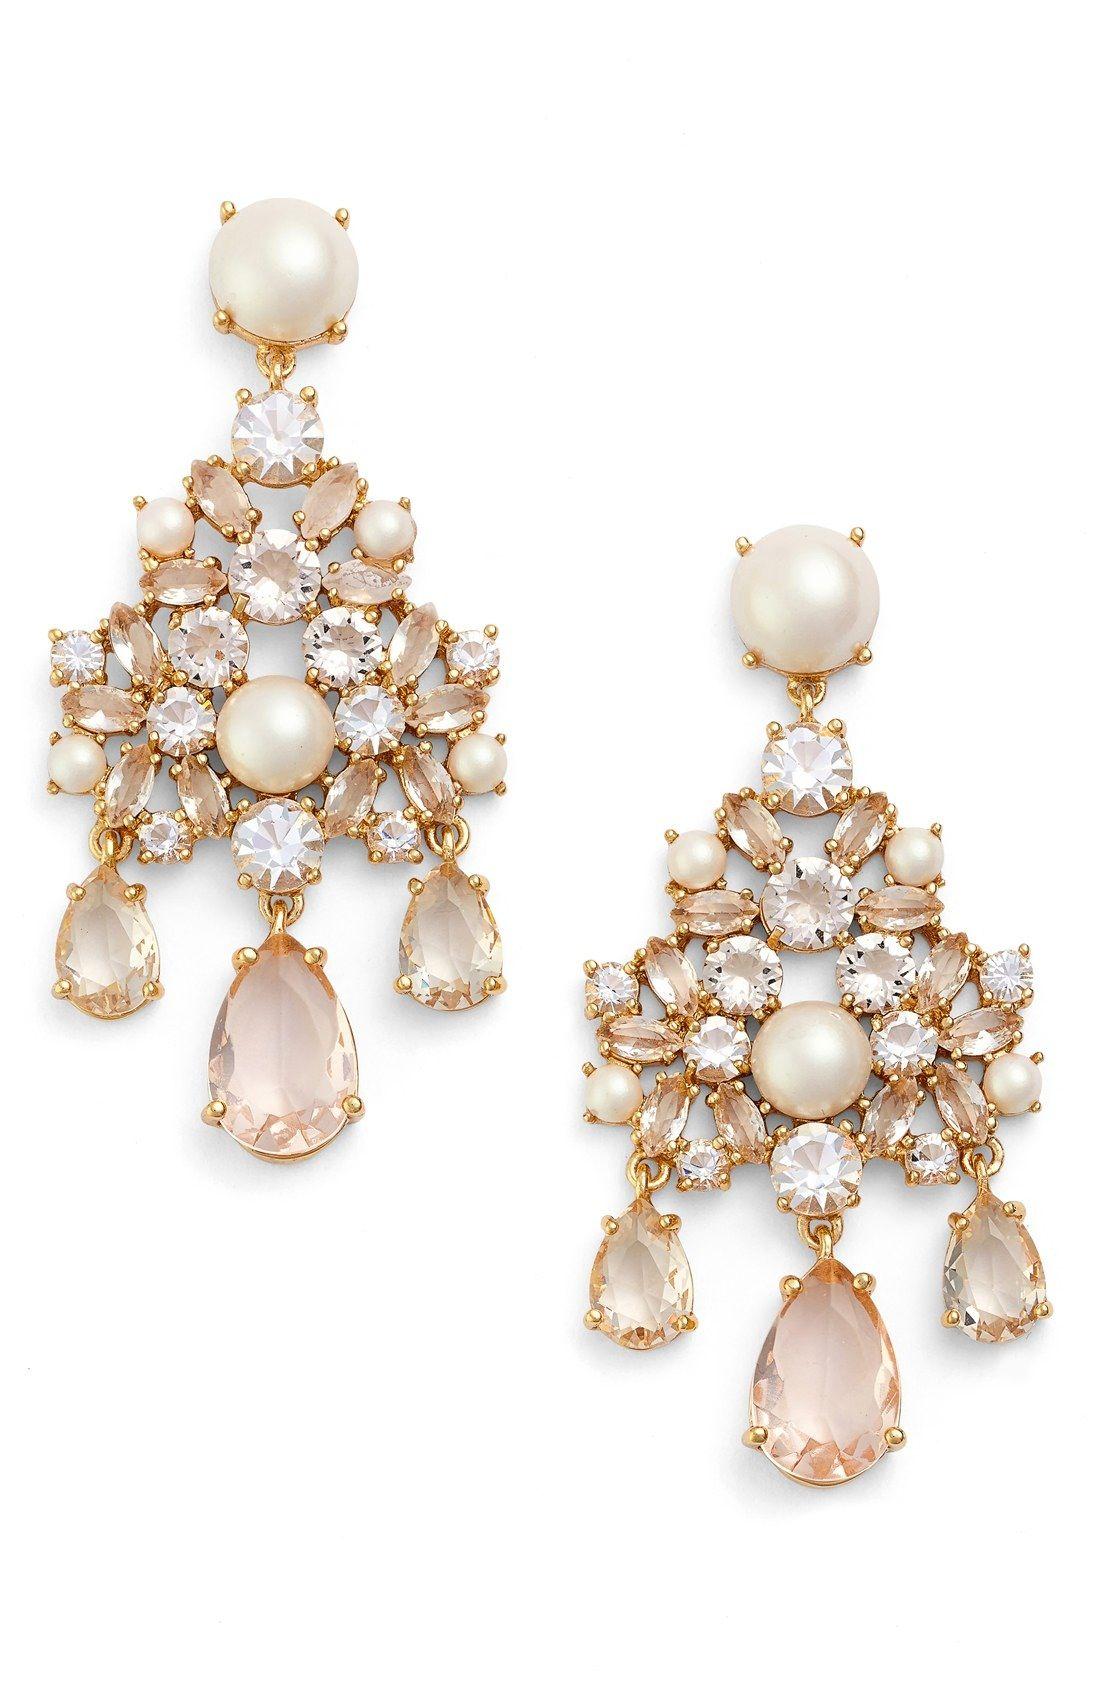 Kate spade new york posy petals crystal chandelier earrings kate spade new york posy petals crystal chandelier earrings available at nordstrom arubaitofo Choice Image